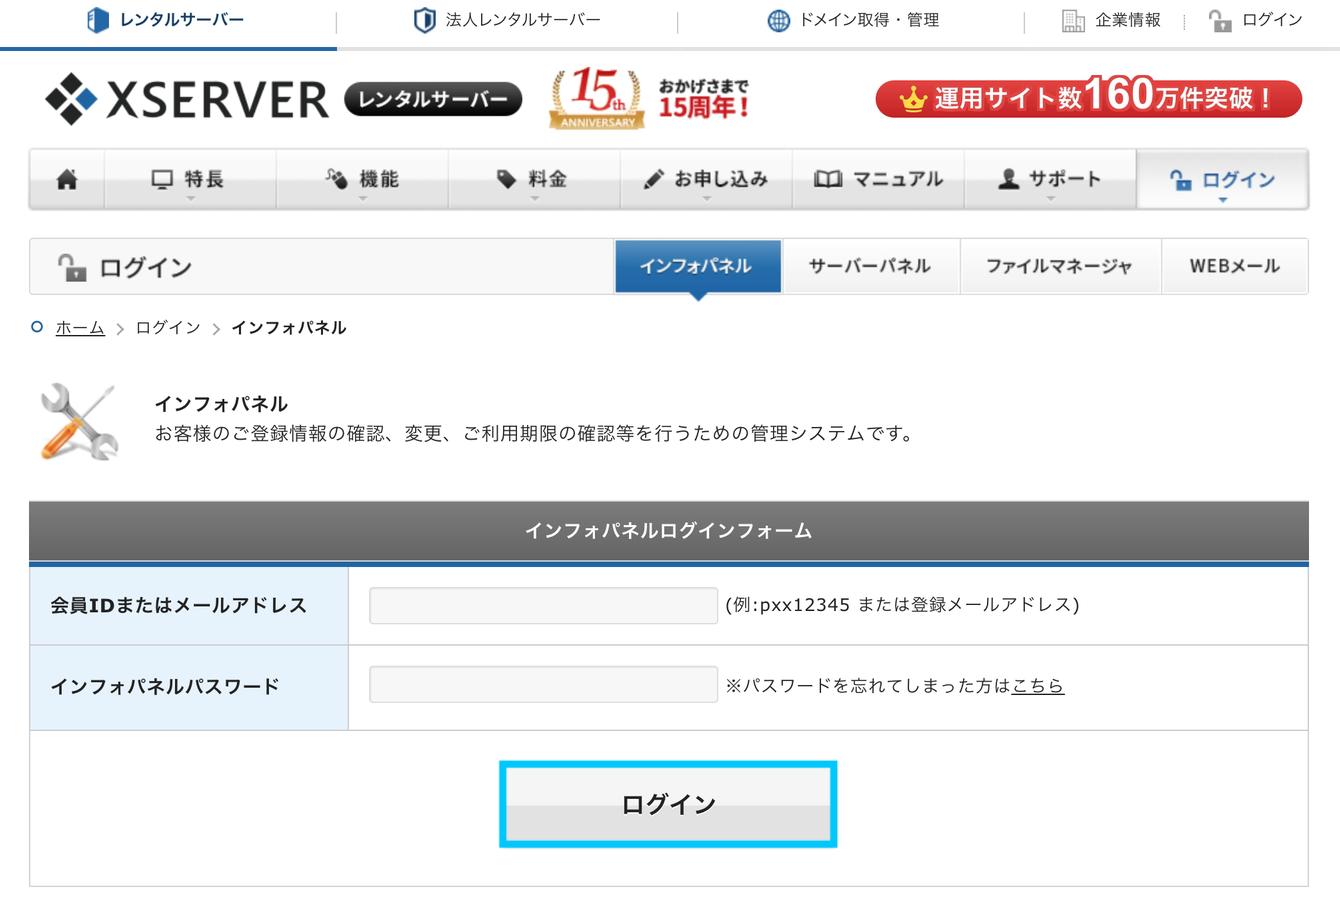 Xserverにログインする